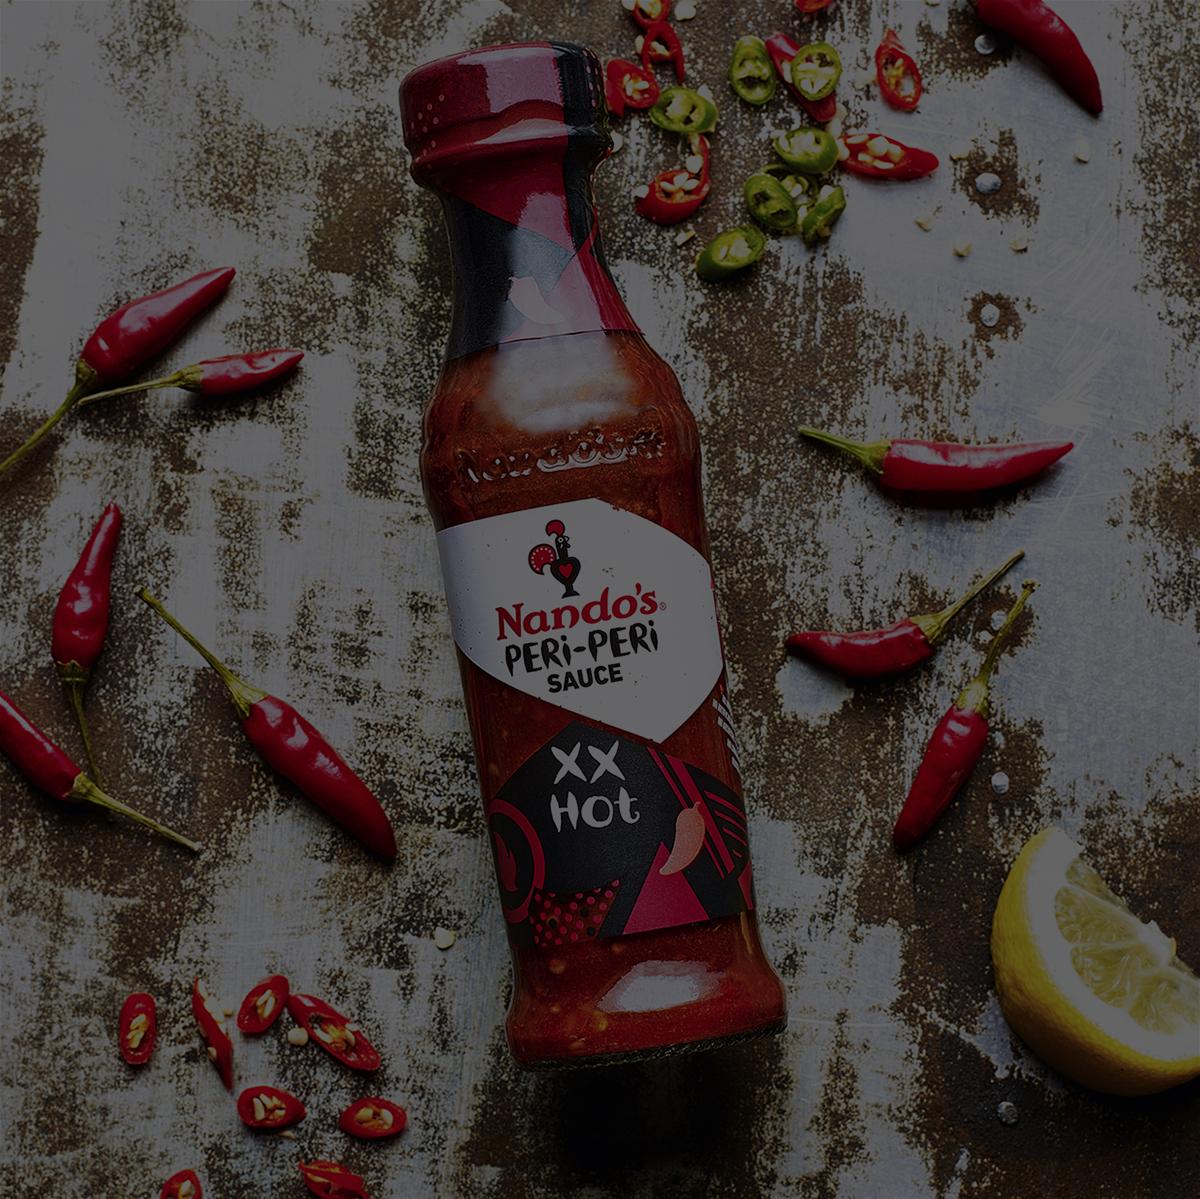 XX Hot PERi-PERi Sauce